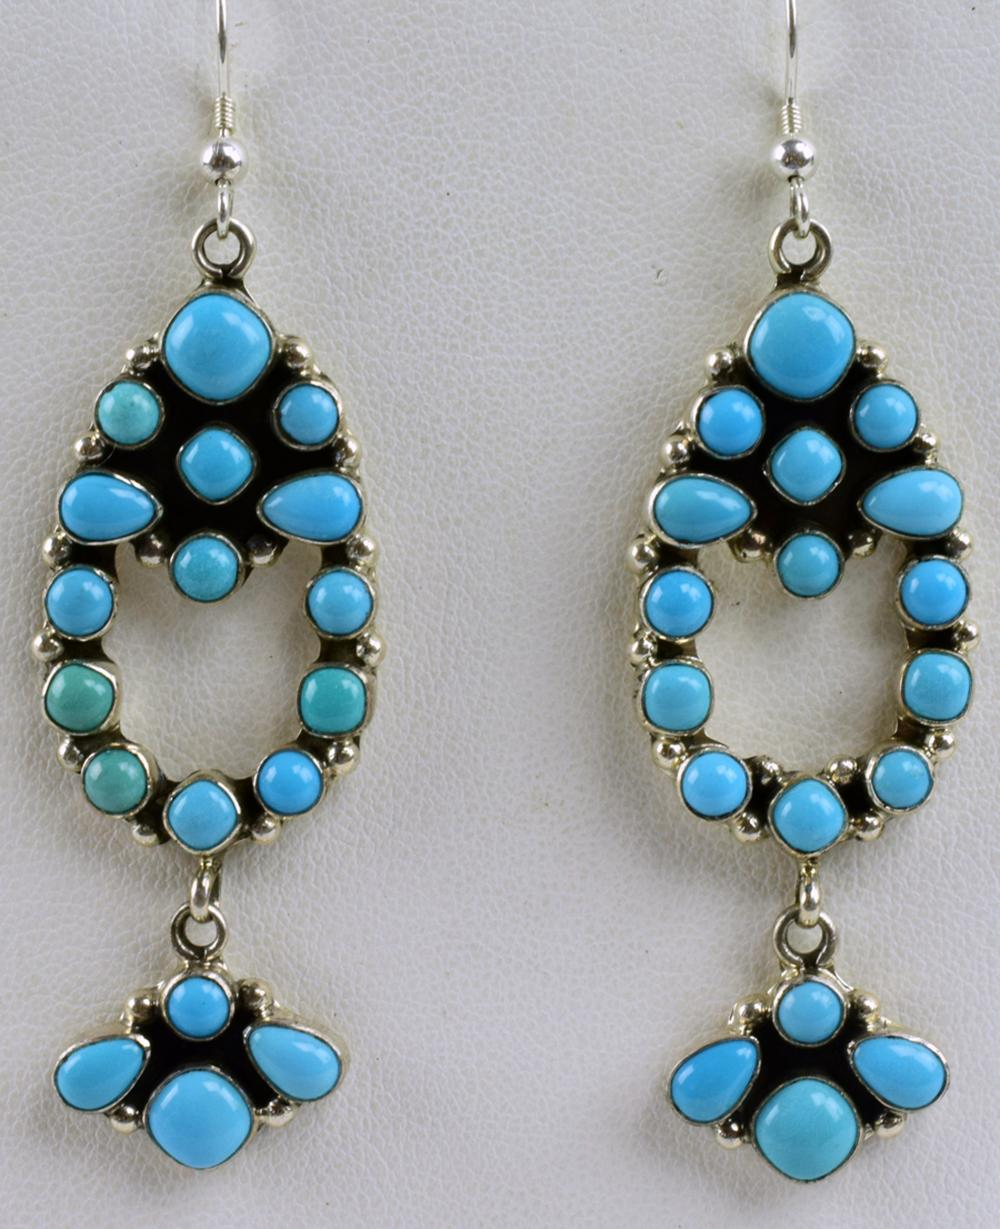 Navajo Sleeping Beauty Turquoise Earrings-Emma Lincoln